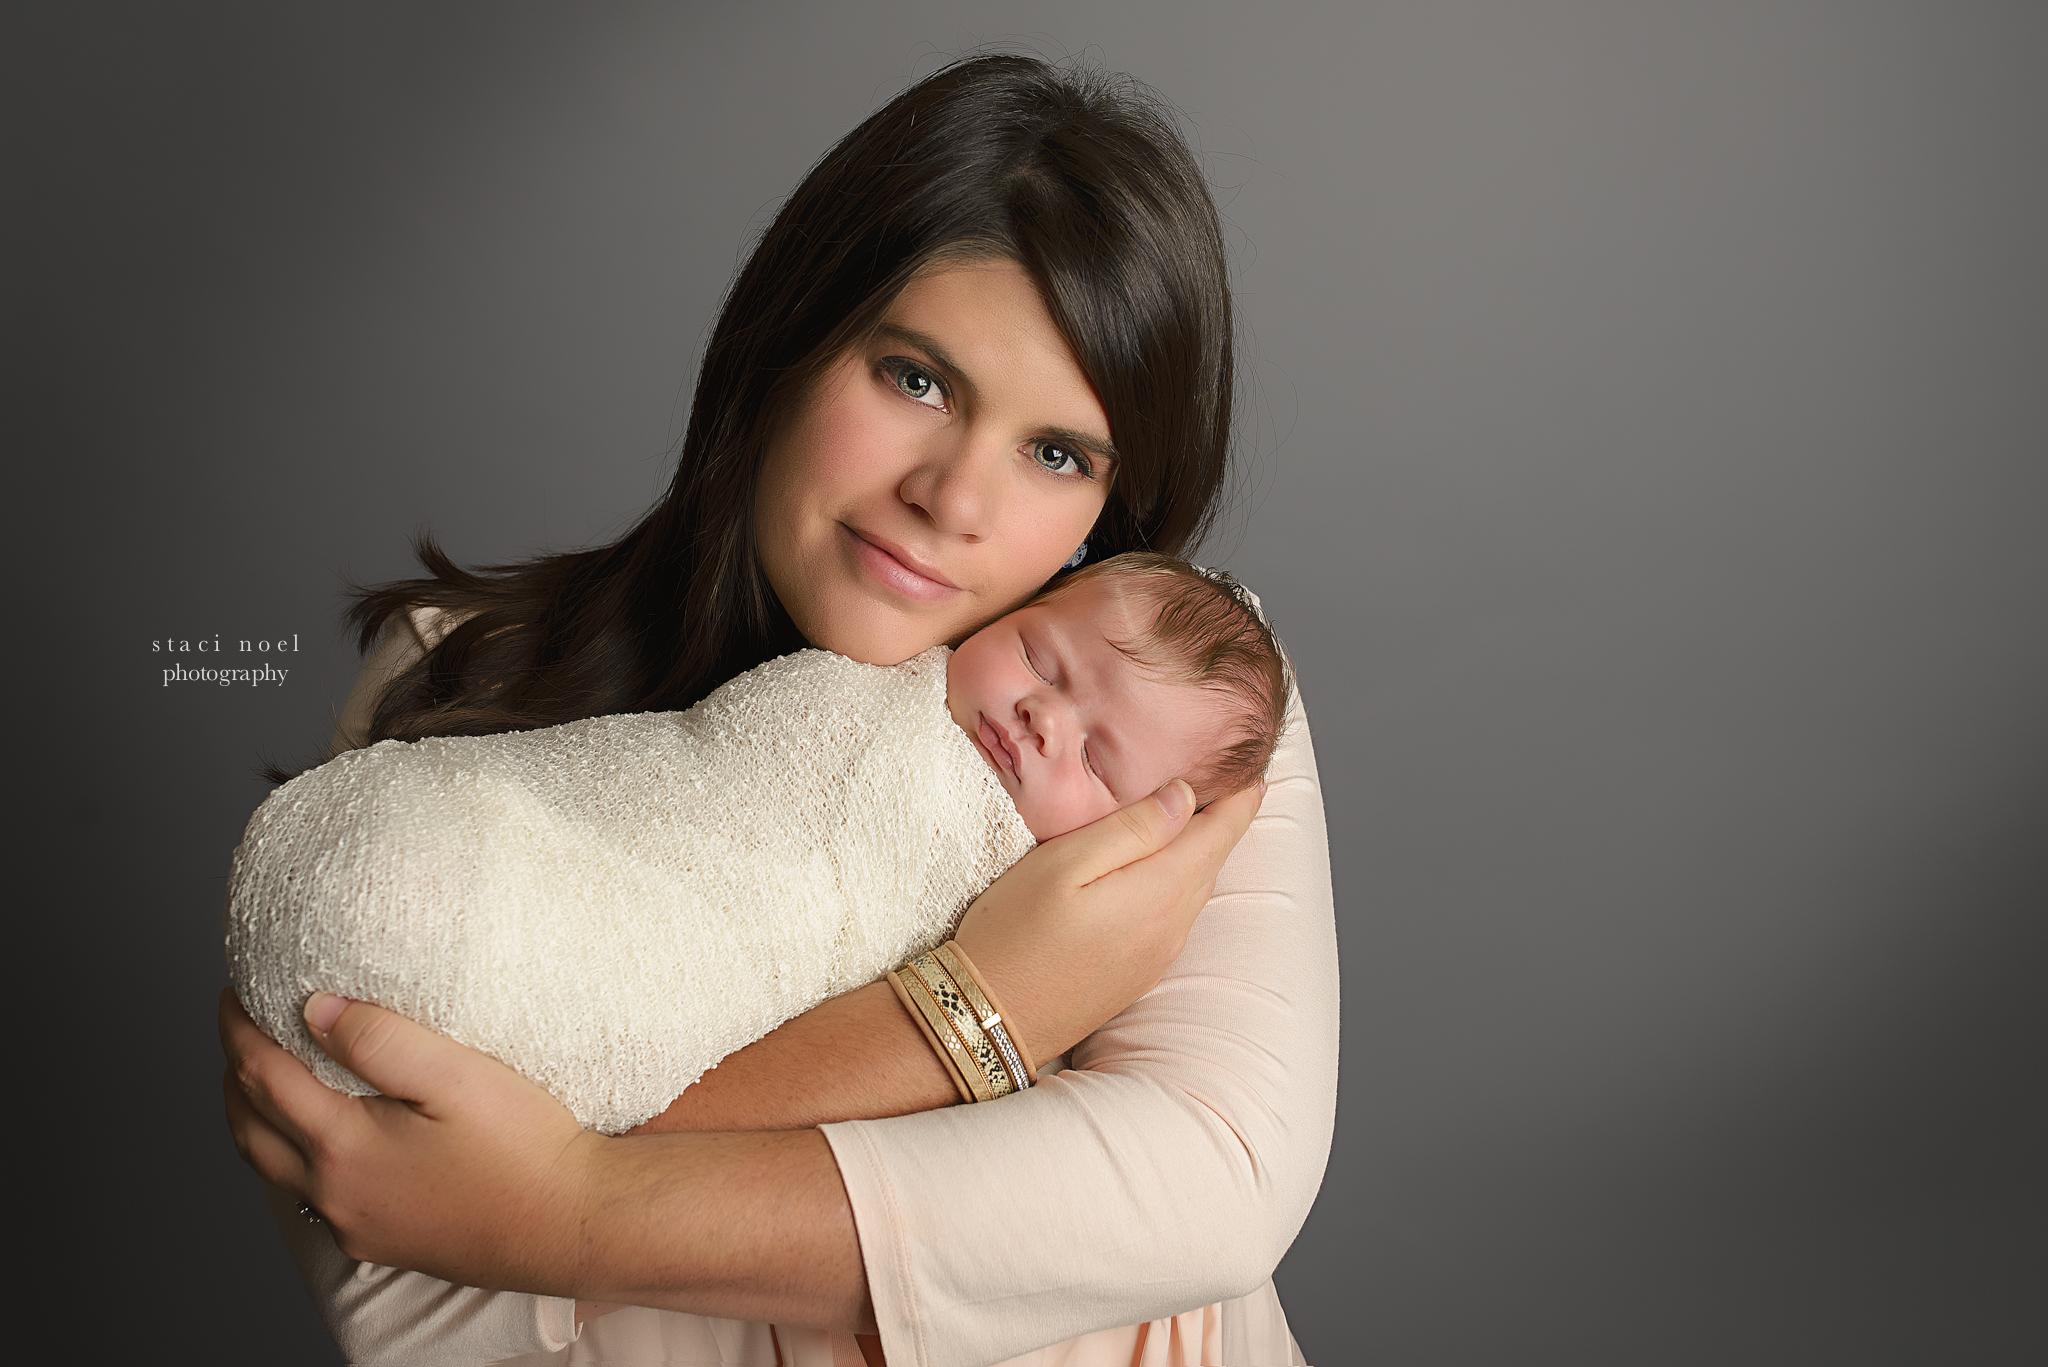 charlotte newborn photography staci noel